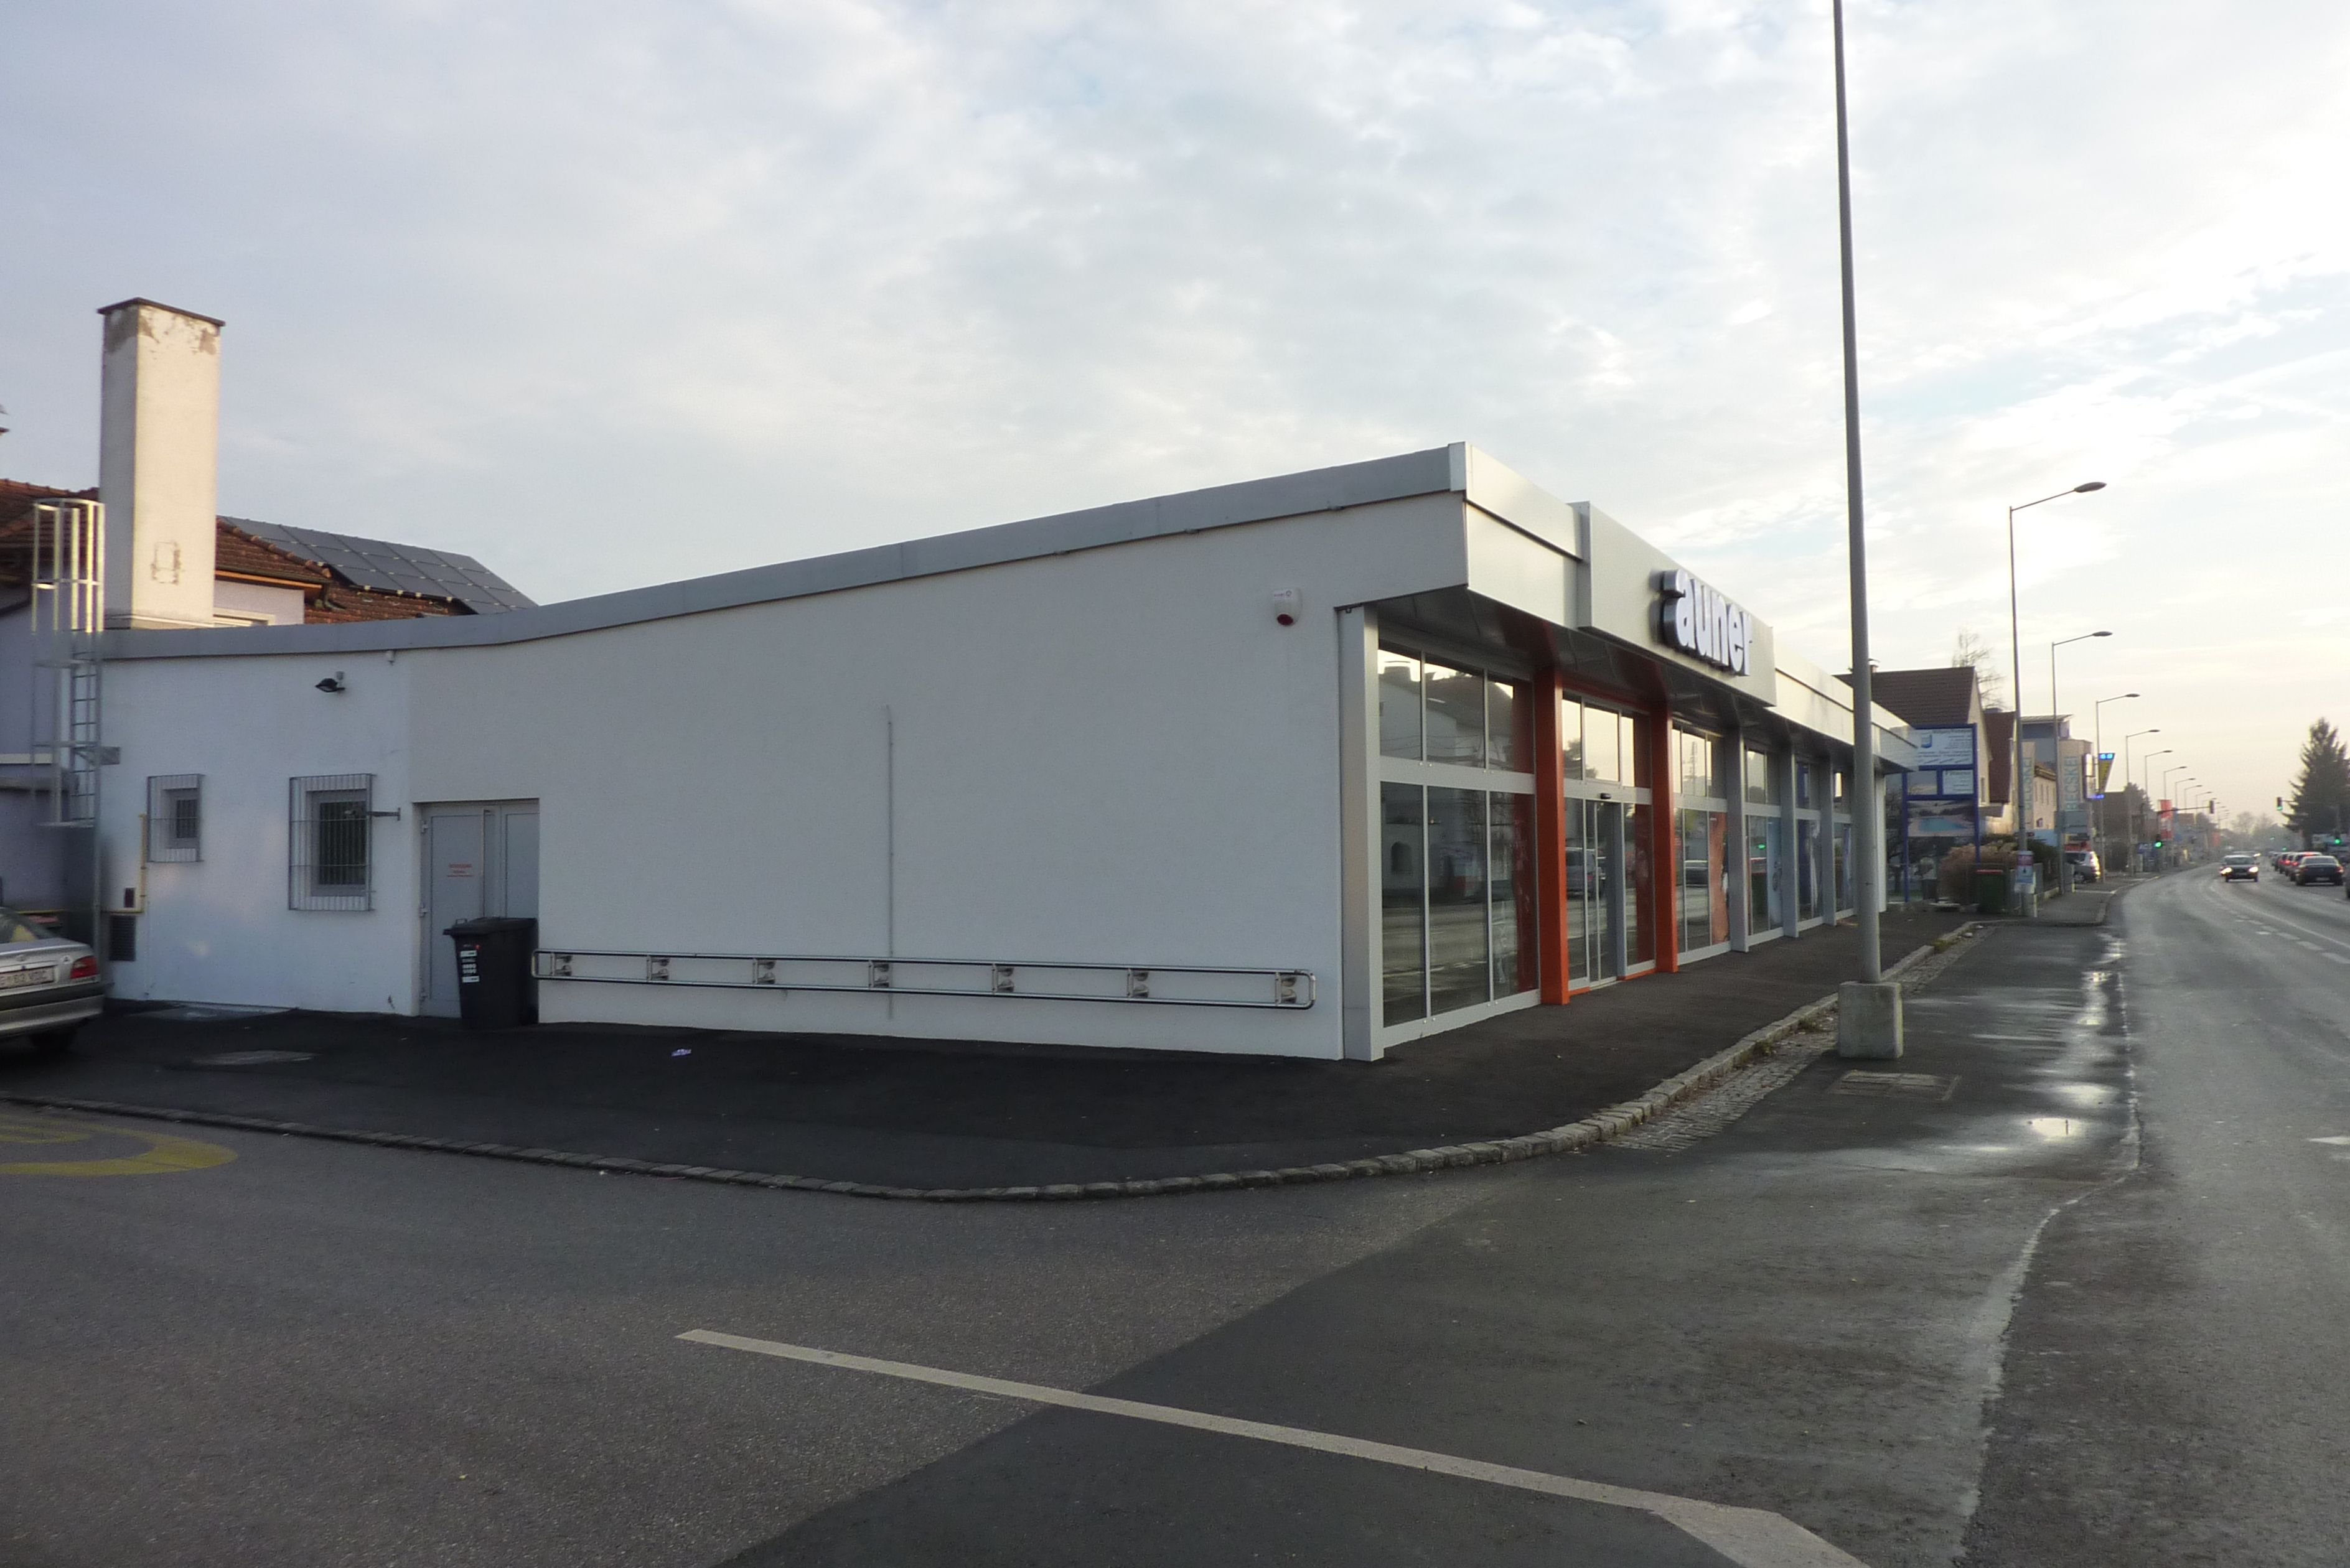 Filiale Nr. 94, Kärntner Straße 141: repräsentative Großfiliale in der stark befahrenen Ausfallsstraße.